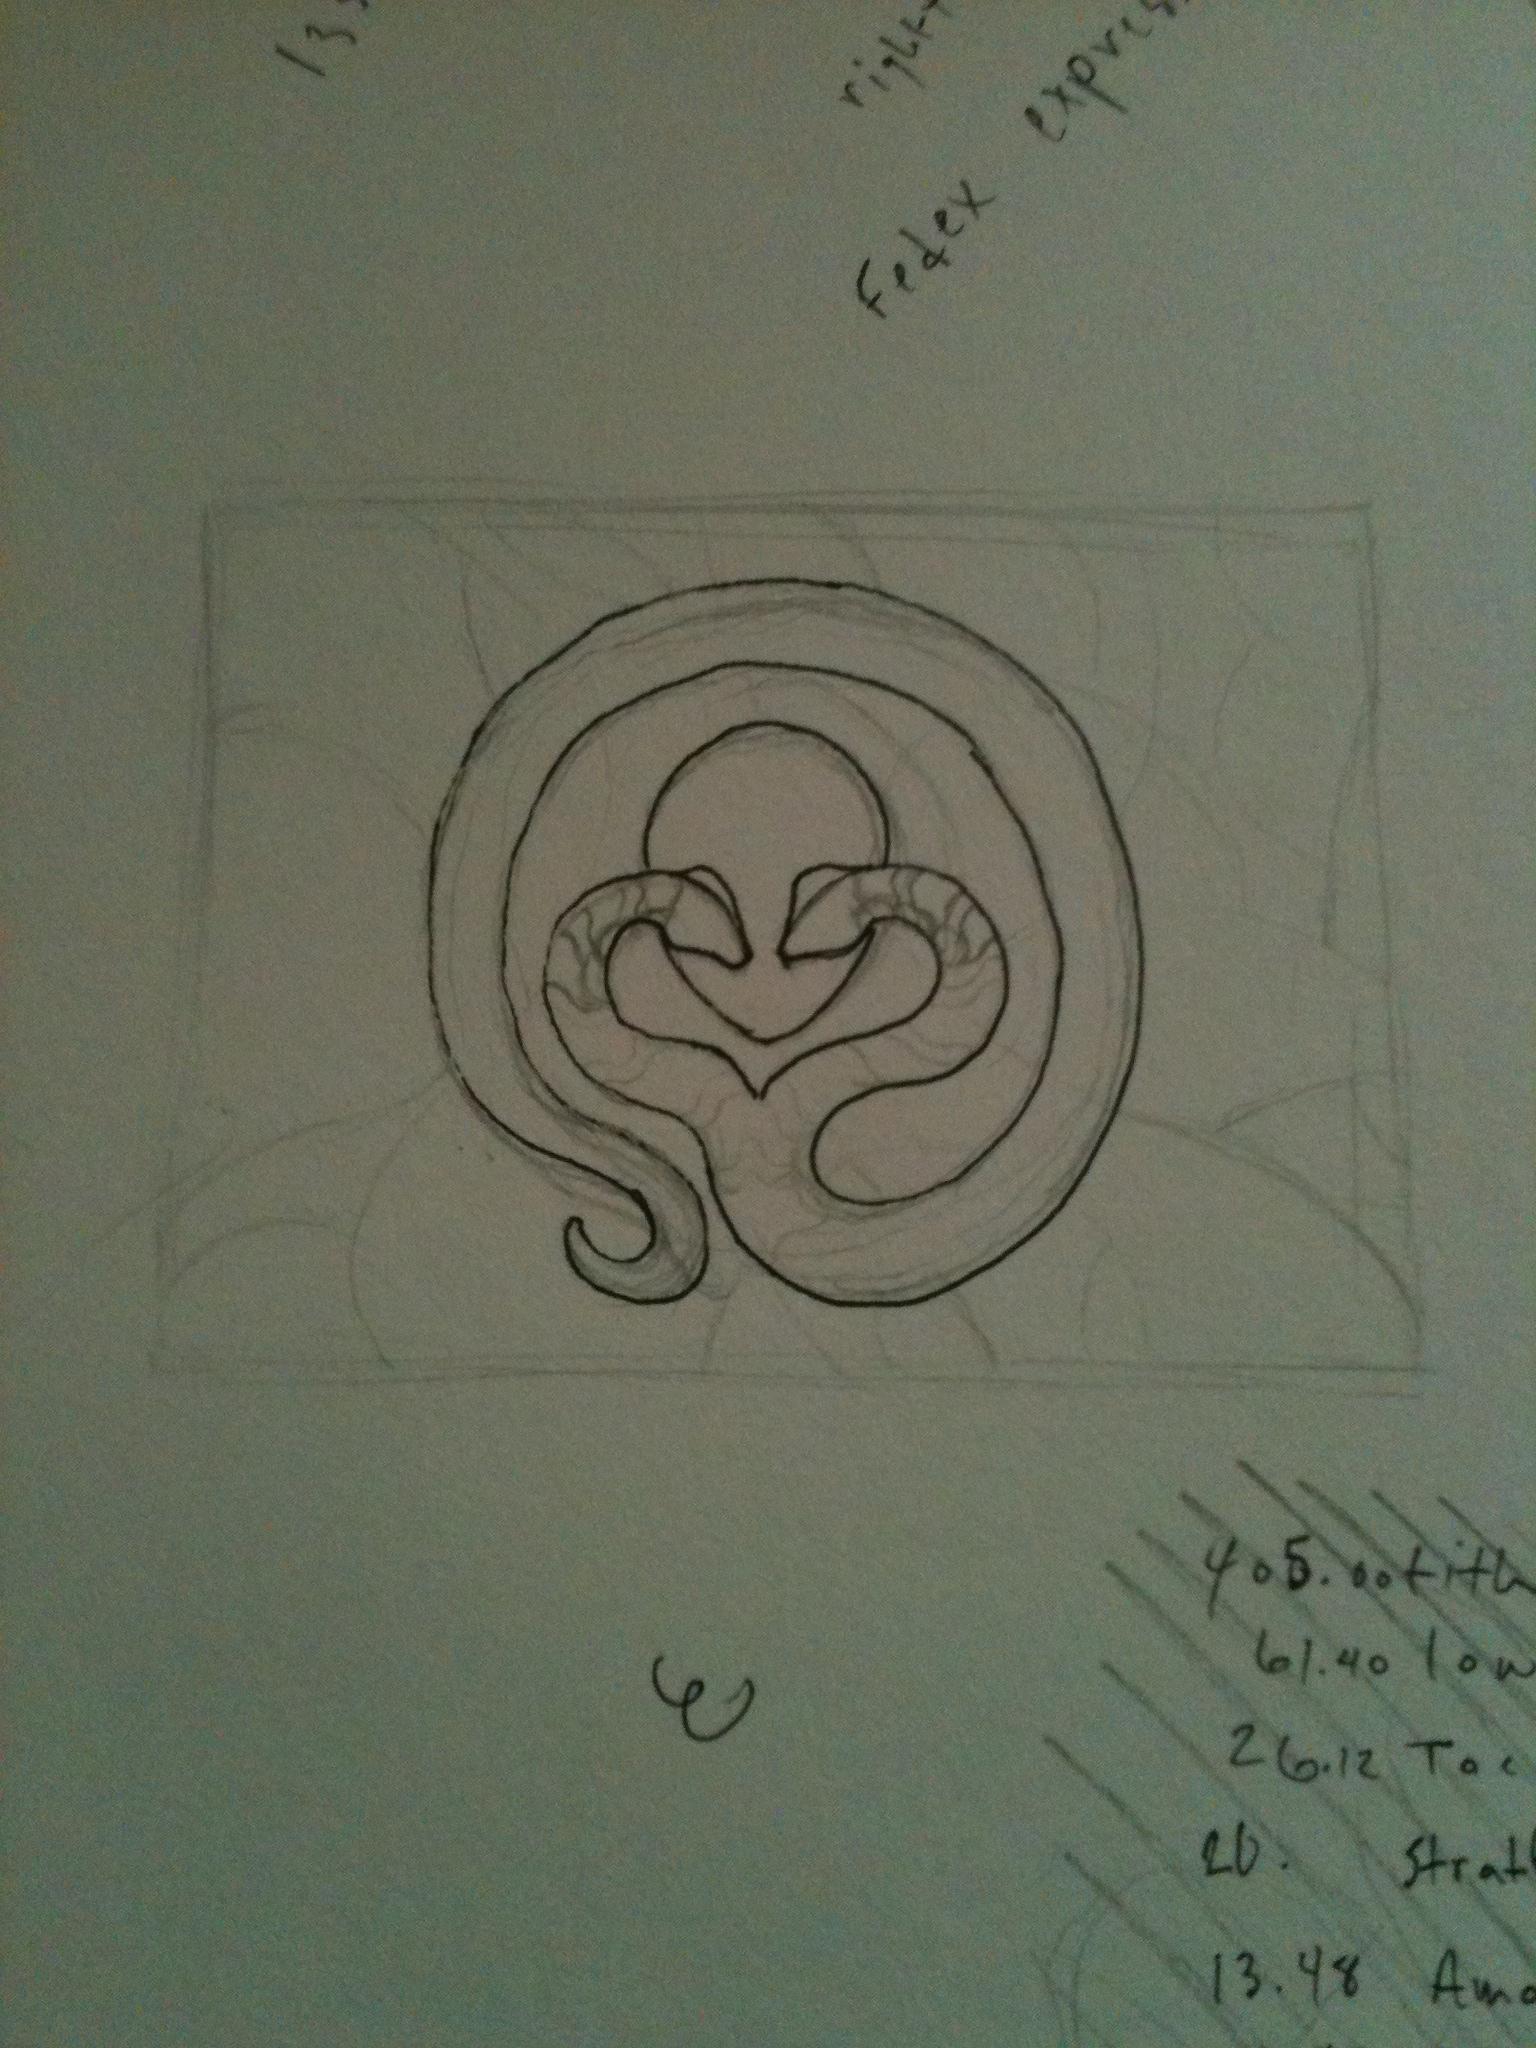 Khaos Explained Logos Design/ Progression - image 3 - student project